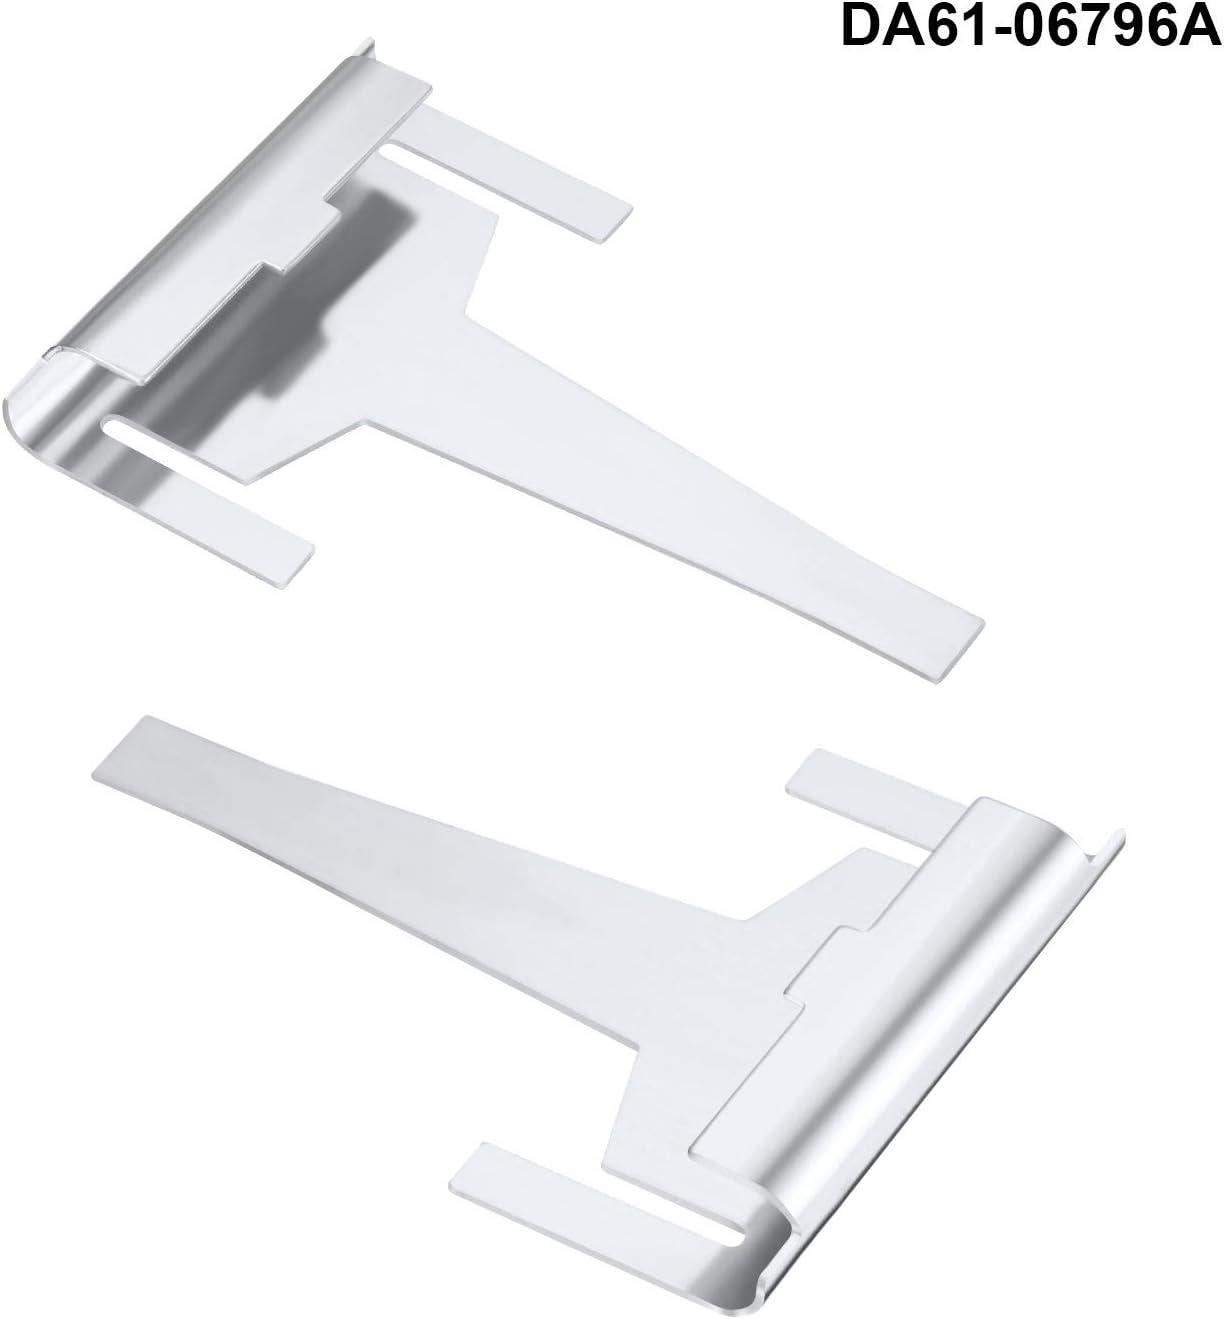 Hotop 3 Pieces Refrigerator Defrost Element Compatible with Samsung Including DA61-06796A Clip Drain Evaporator Refoem and Refrigerator Defrost Temp Sensor DA32-00006W and DA32-00006S